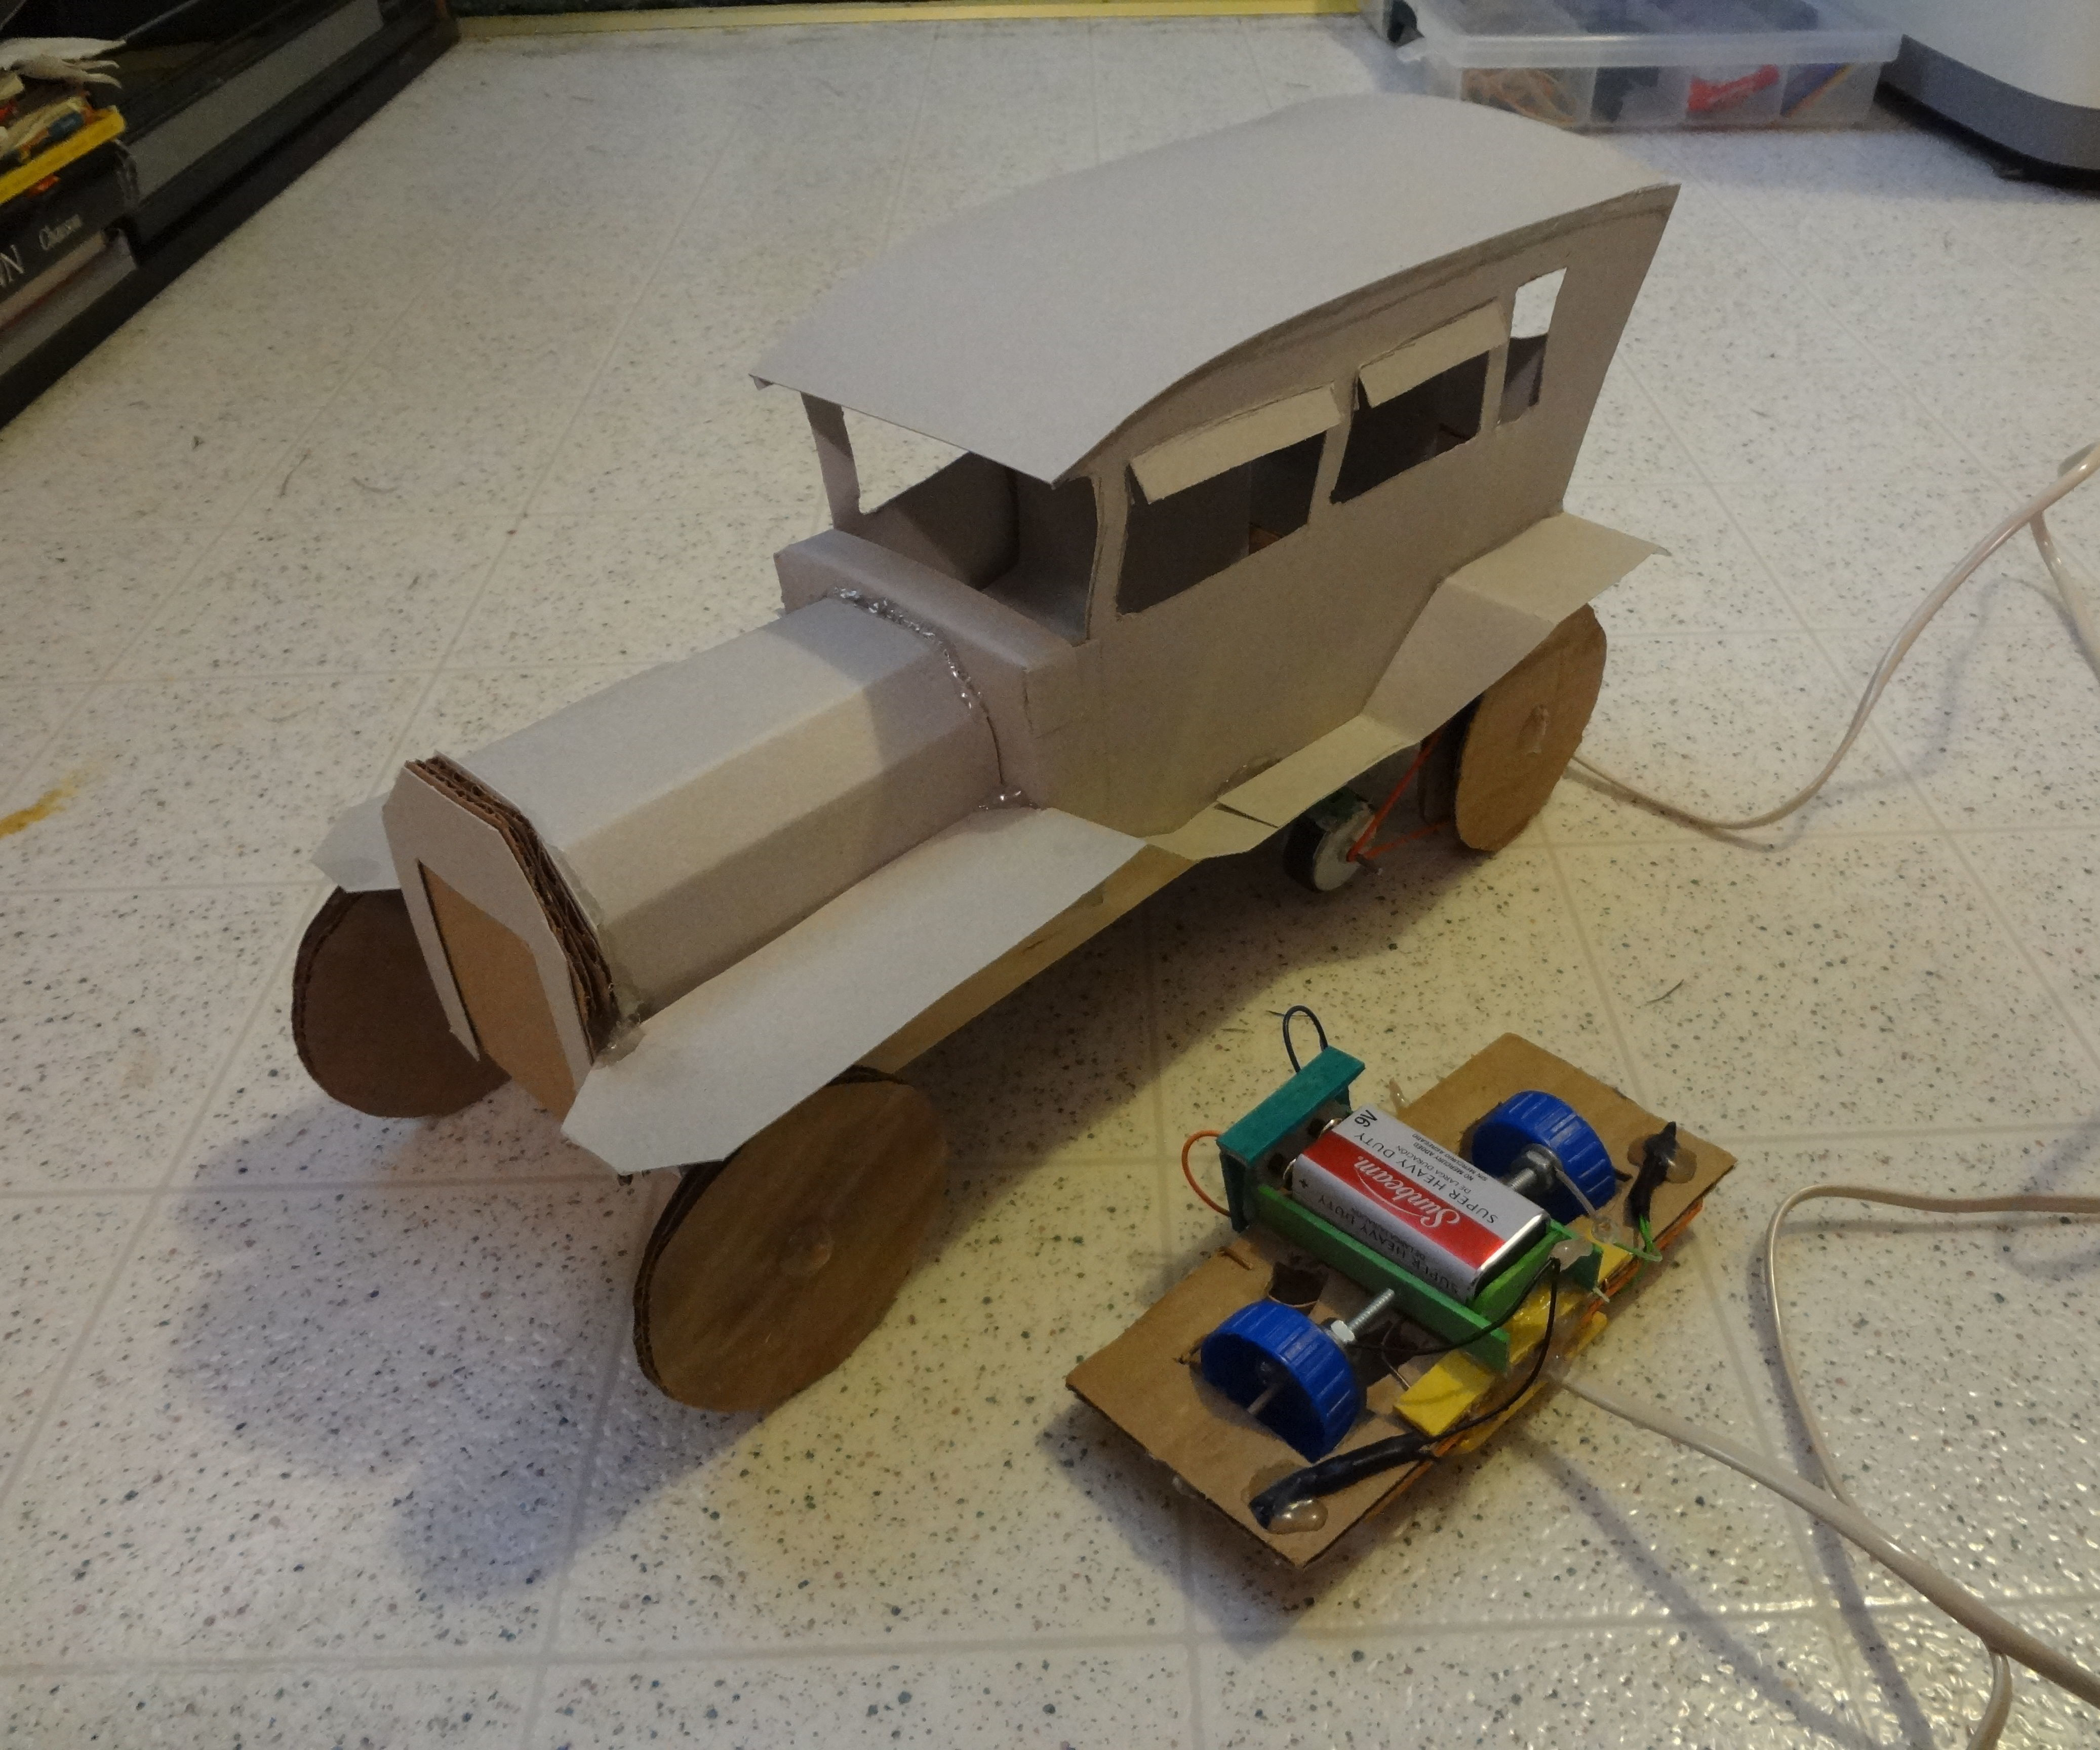 Cardboard remote controlled car.